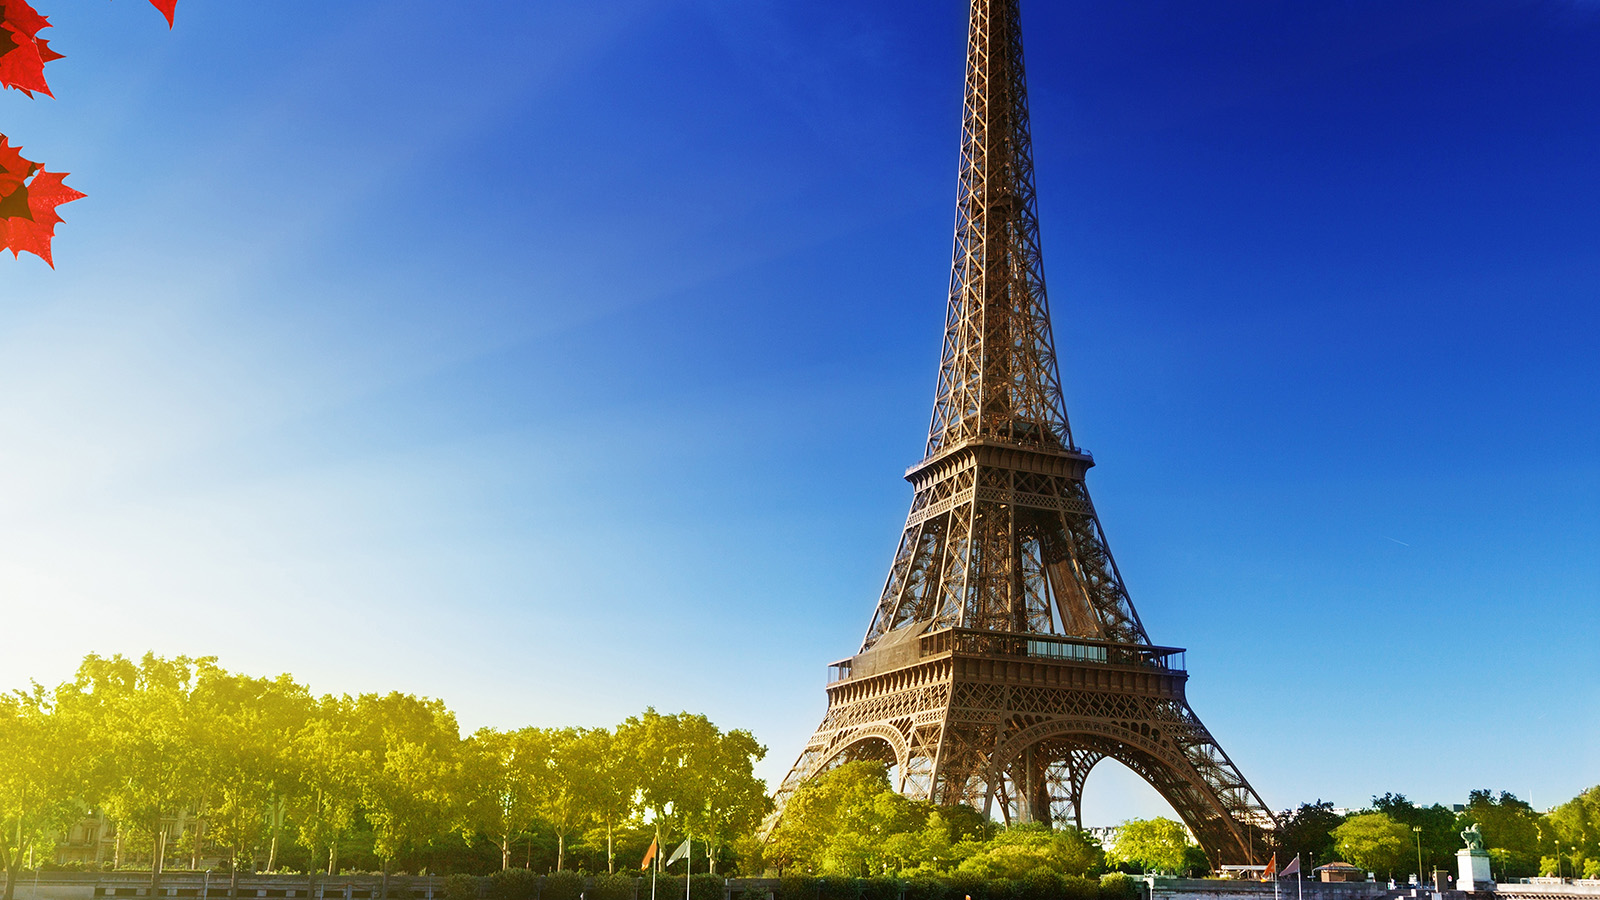 Cute Wallpaper Background For Desktop Na16 Sky Blue Eiffel Tower Nature Paris City Wallpaper